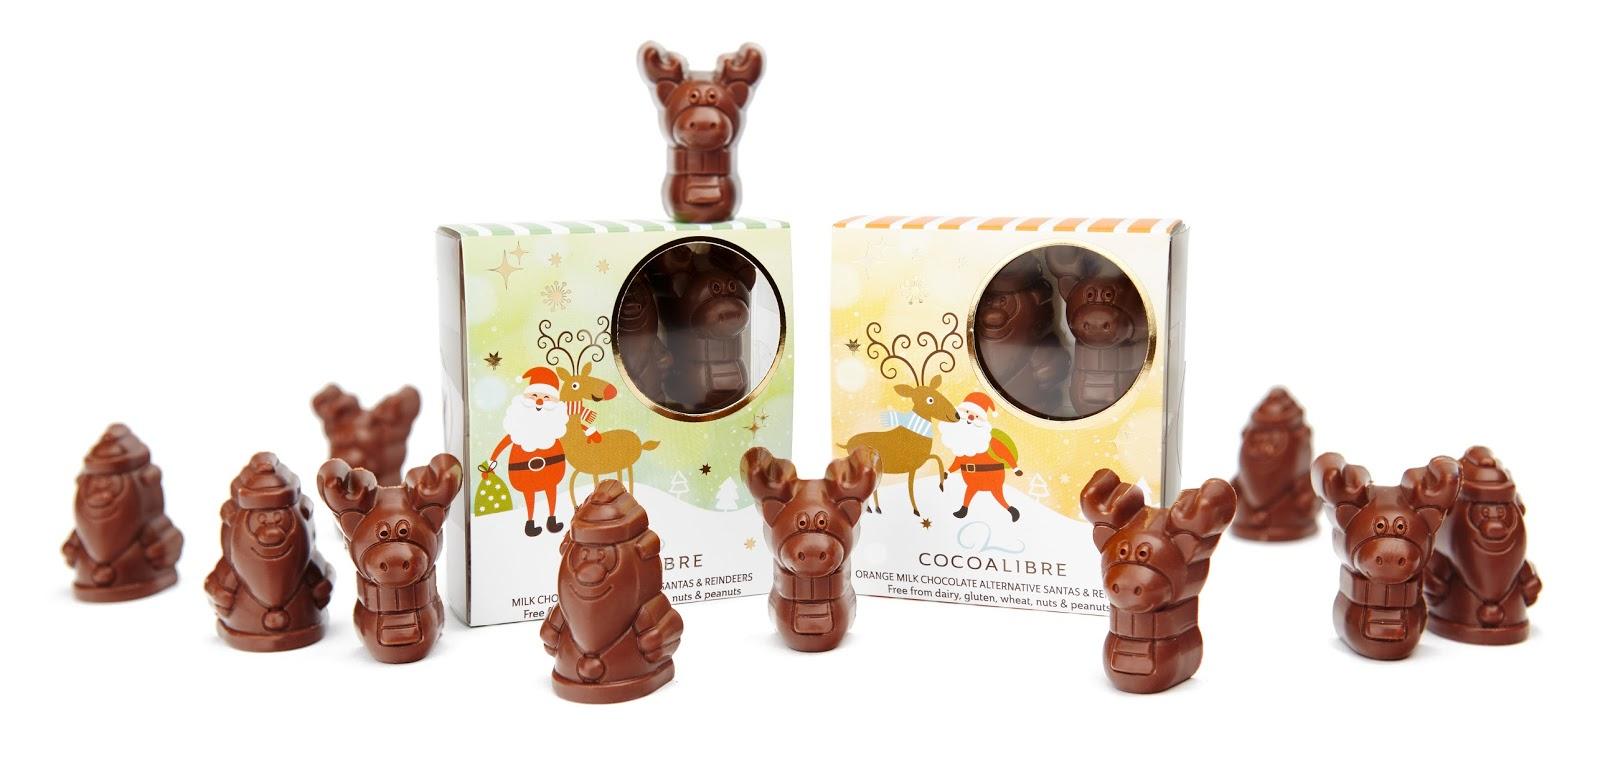 Cocoa Libre Christmas dairy free chocolate